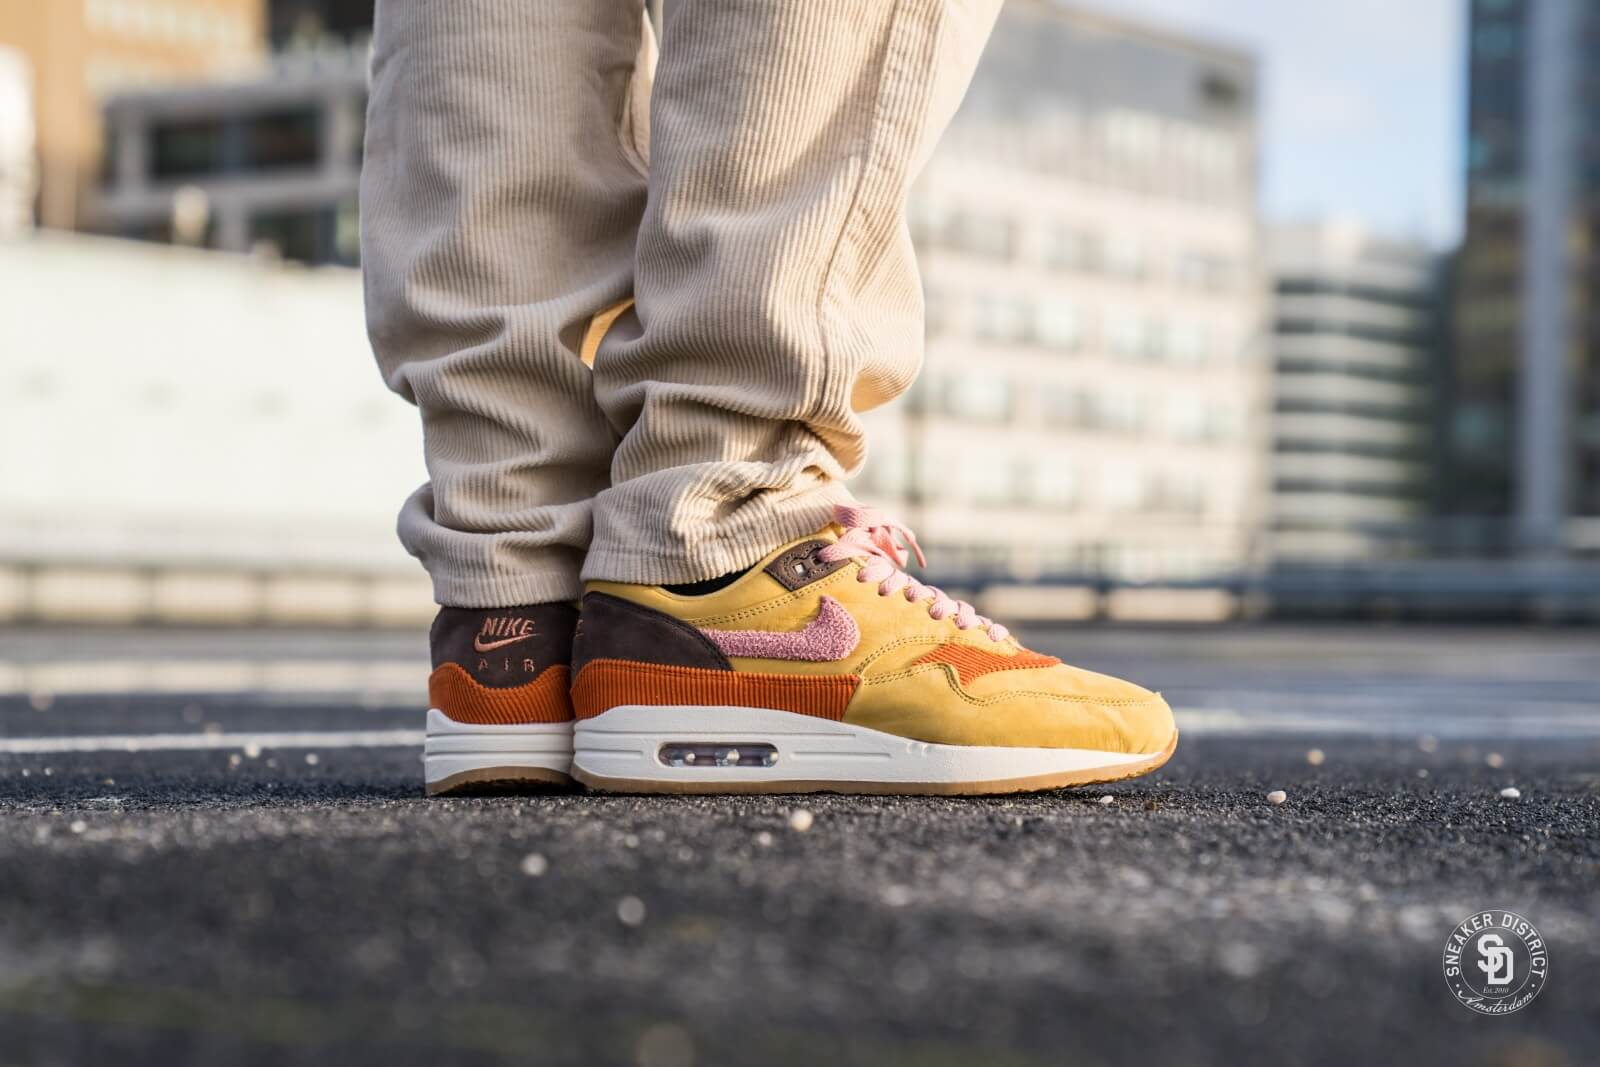 Nike Air Max 1 Wheat Gold/Rust Pink-Baroque Brown